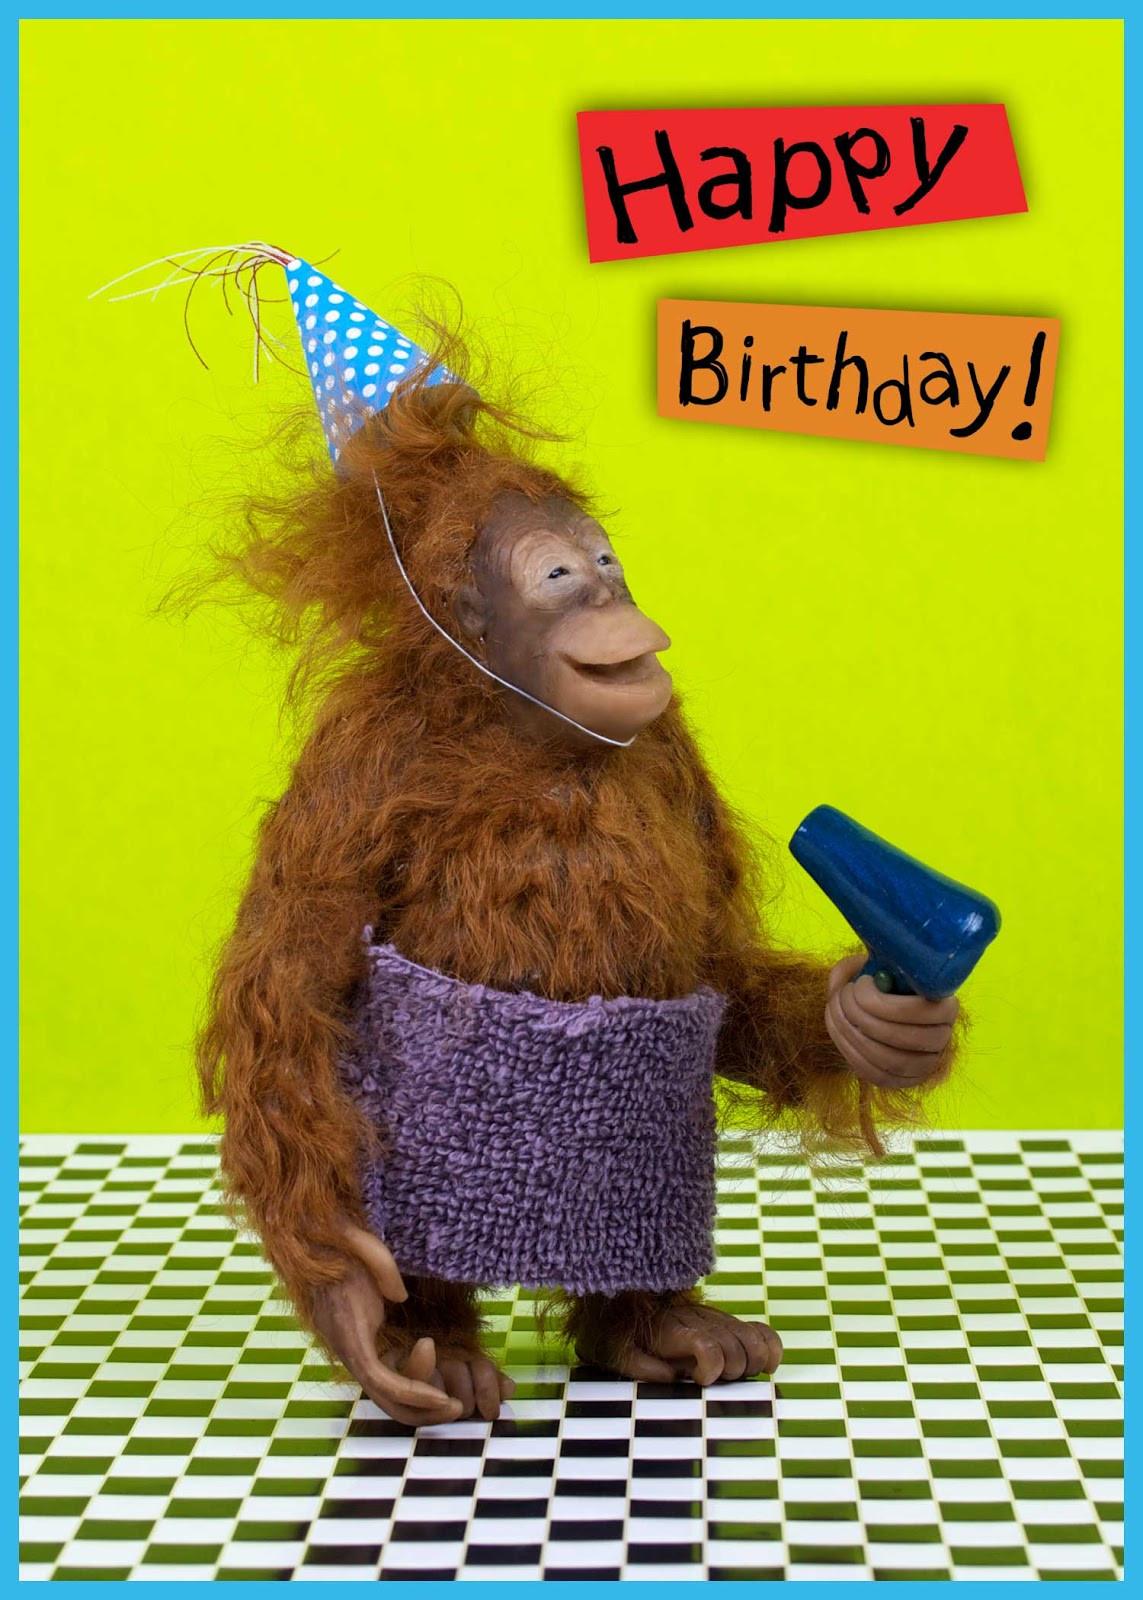 Goofy Birthday Wishes  Caroline Gray Work in Progress Kids' Birthday Cards